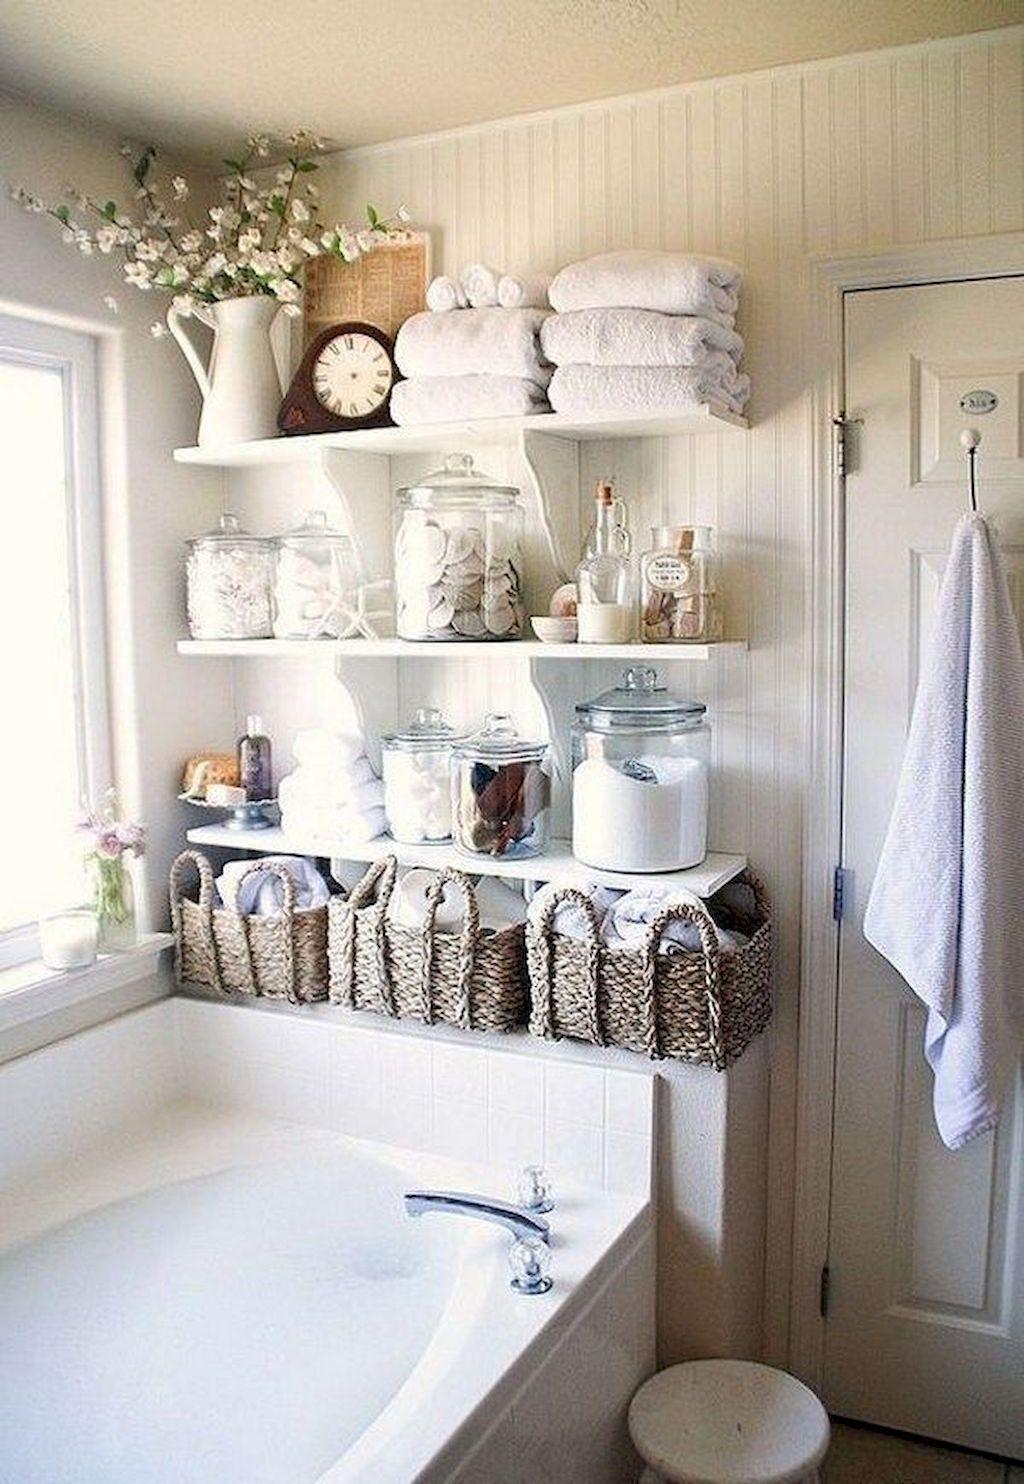 Nice 50 Adorable Shabby Chic Bathroom Decor Ideas https://livinking ...